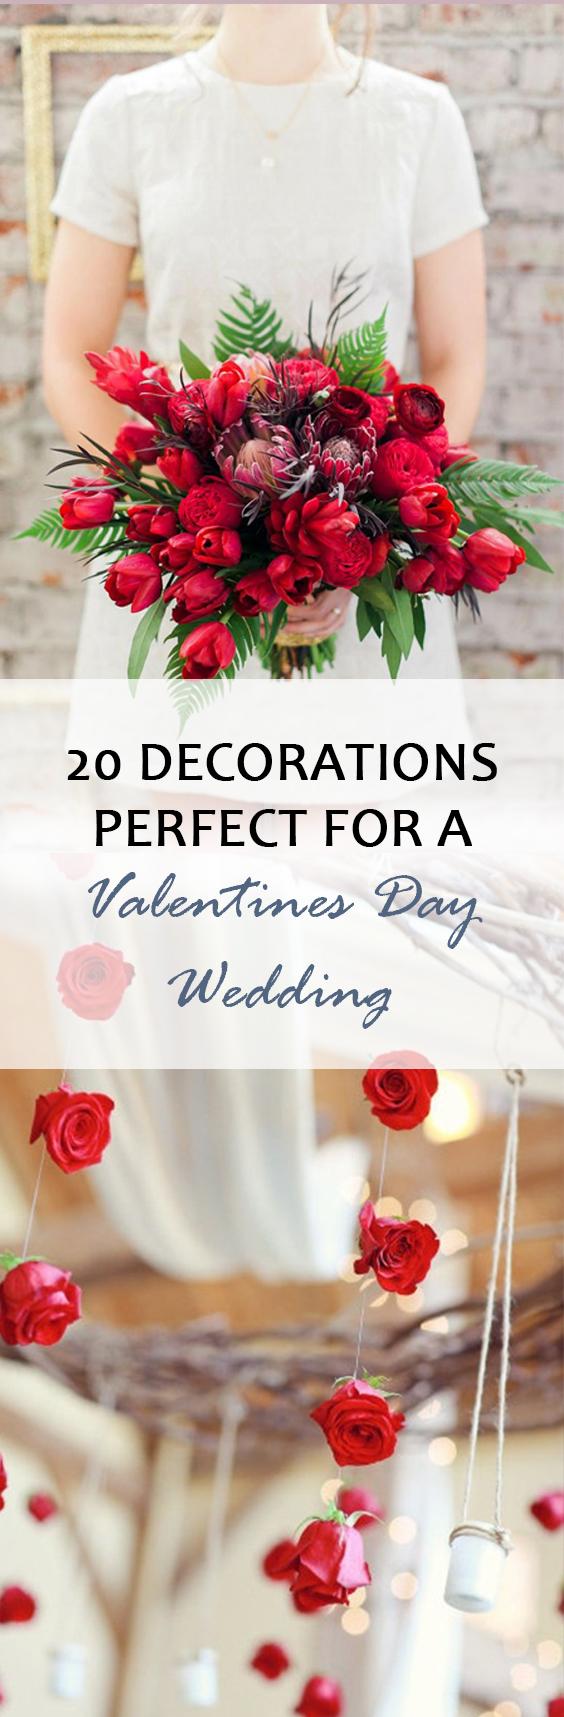 Valentines day, Valentine's Day Wedding, Wedding Decor, Wedding Decor tips, DIY Wedding, popular pin, Dream Wedding, Dream Wedding Decor